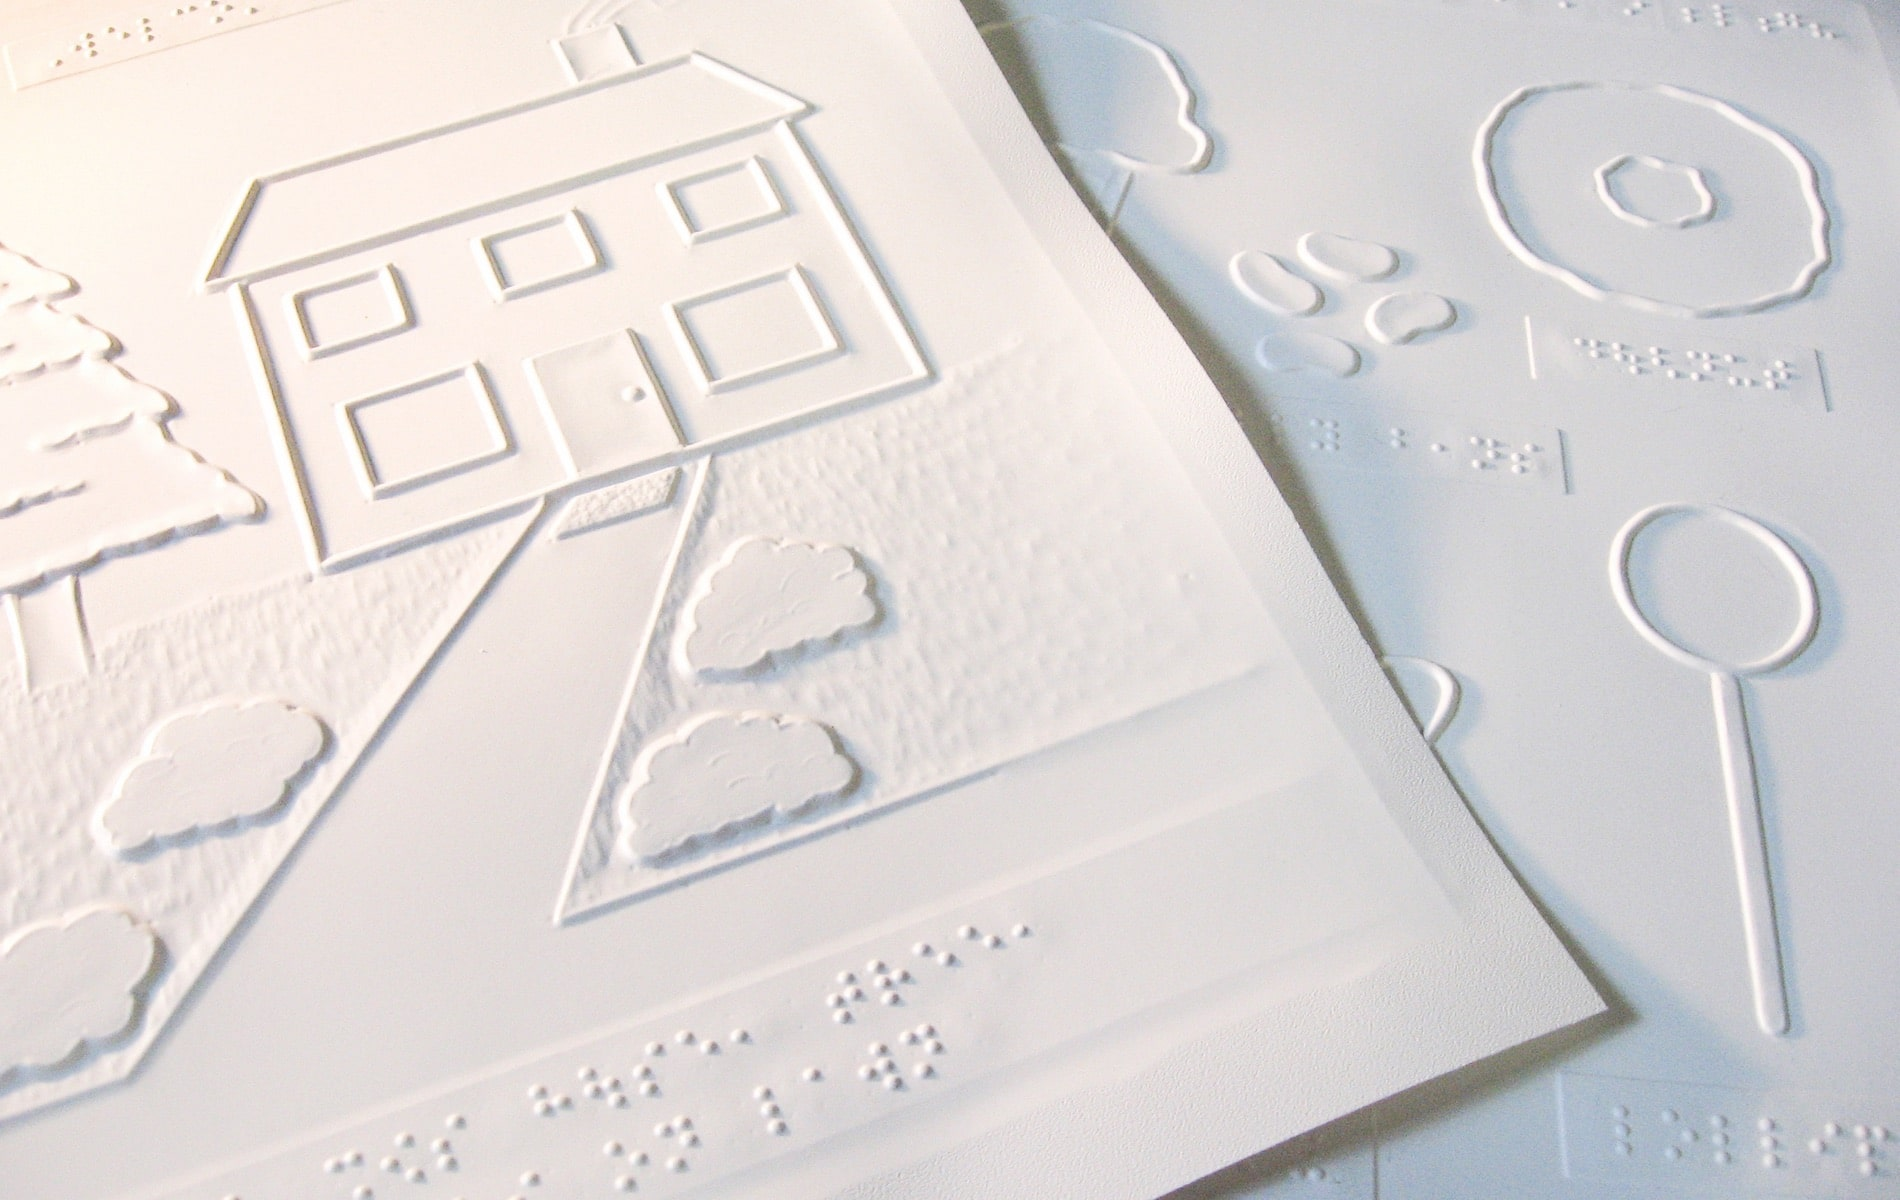 The National Braille Press, Nick Racheotes Column